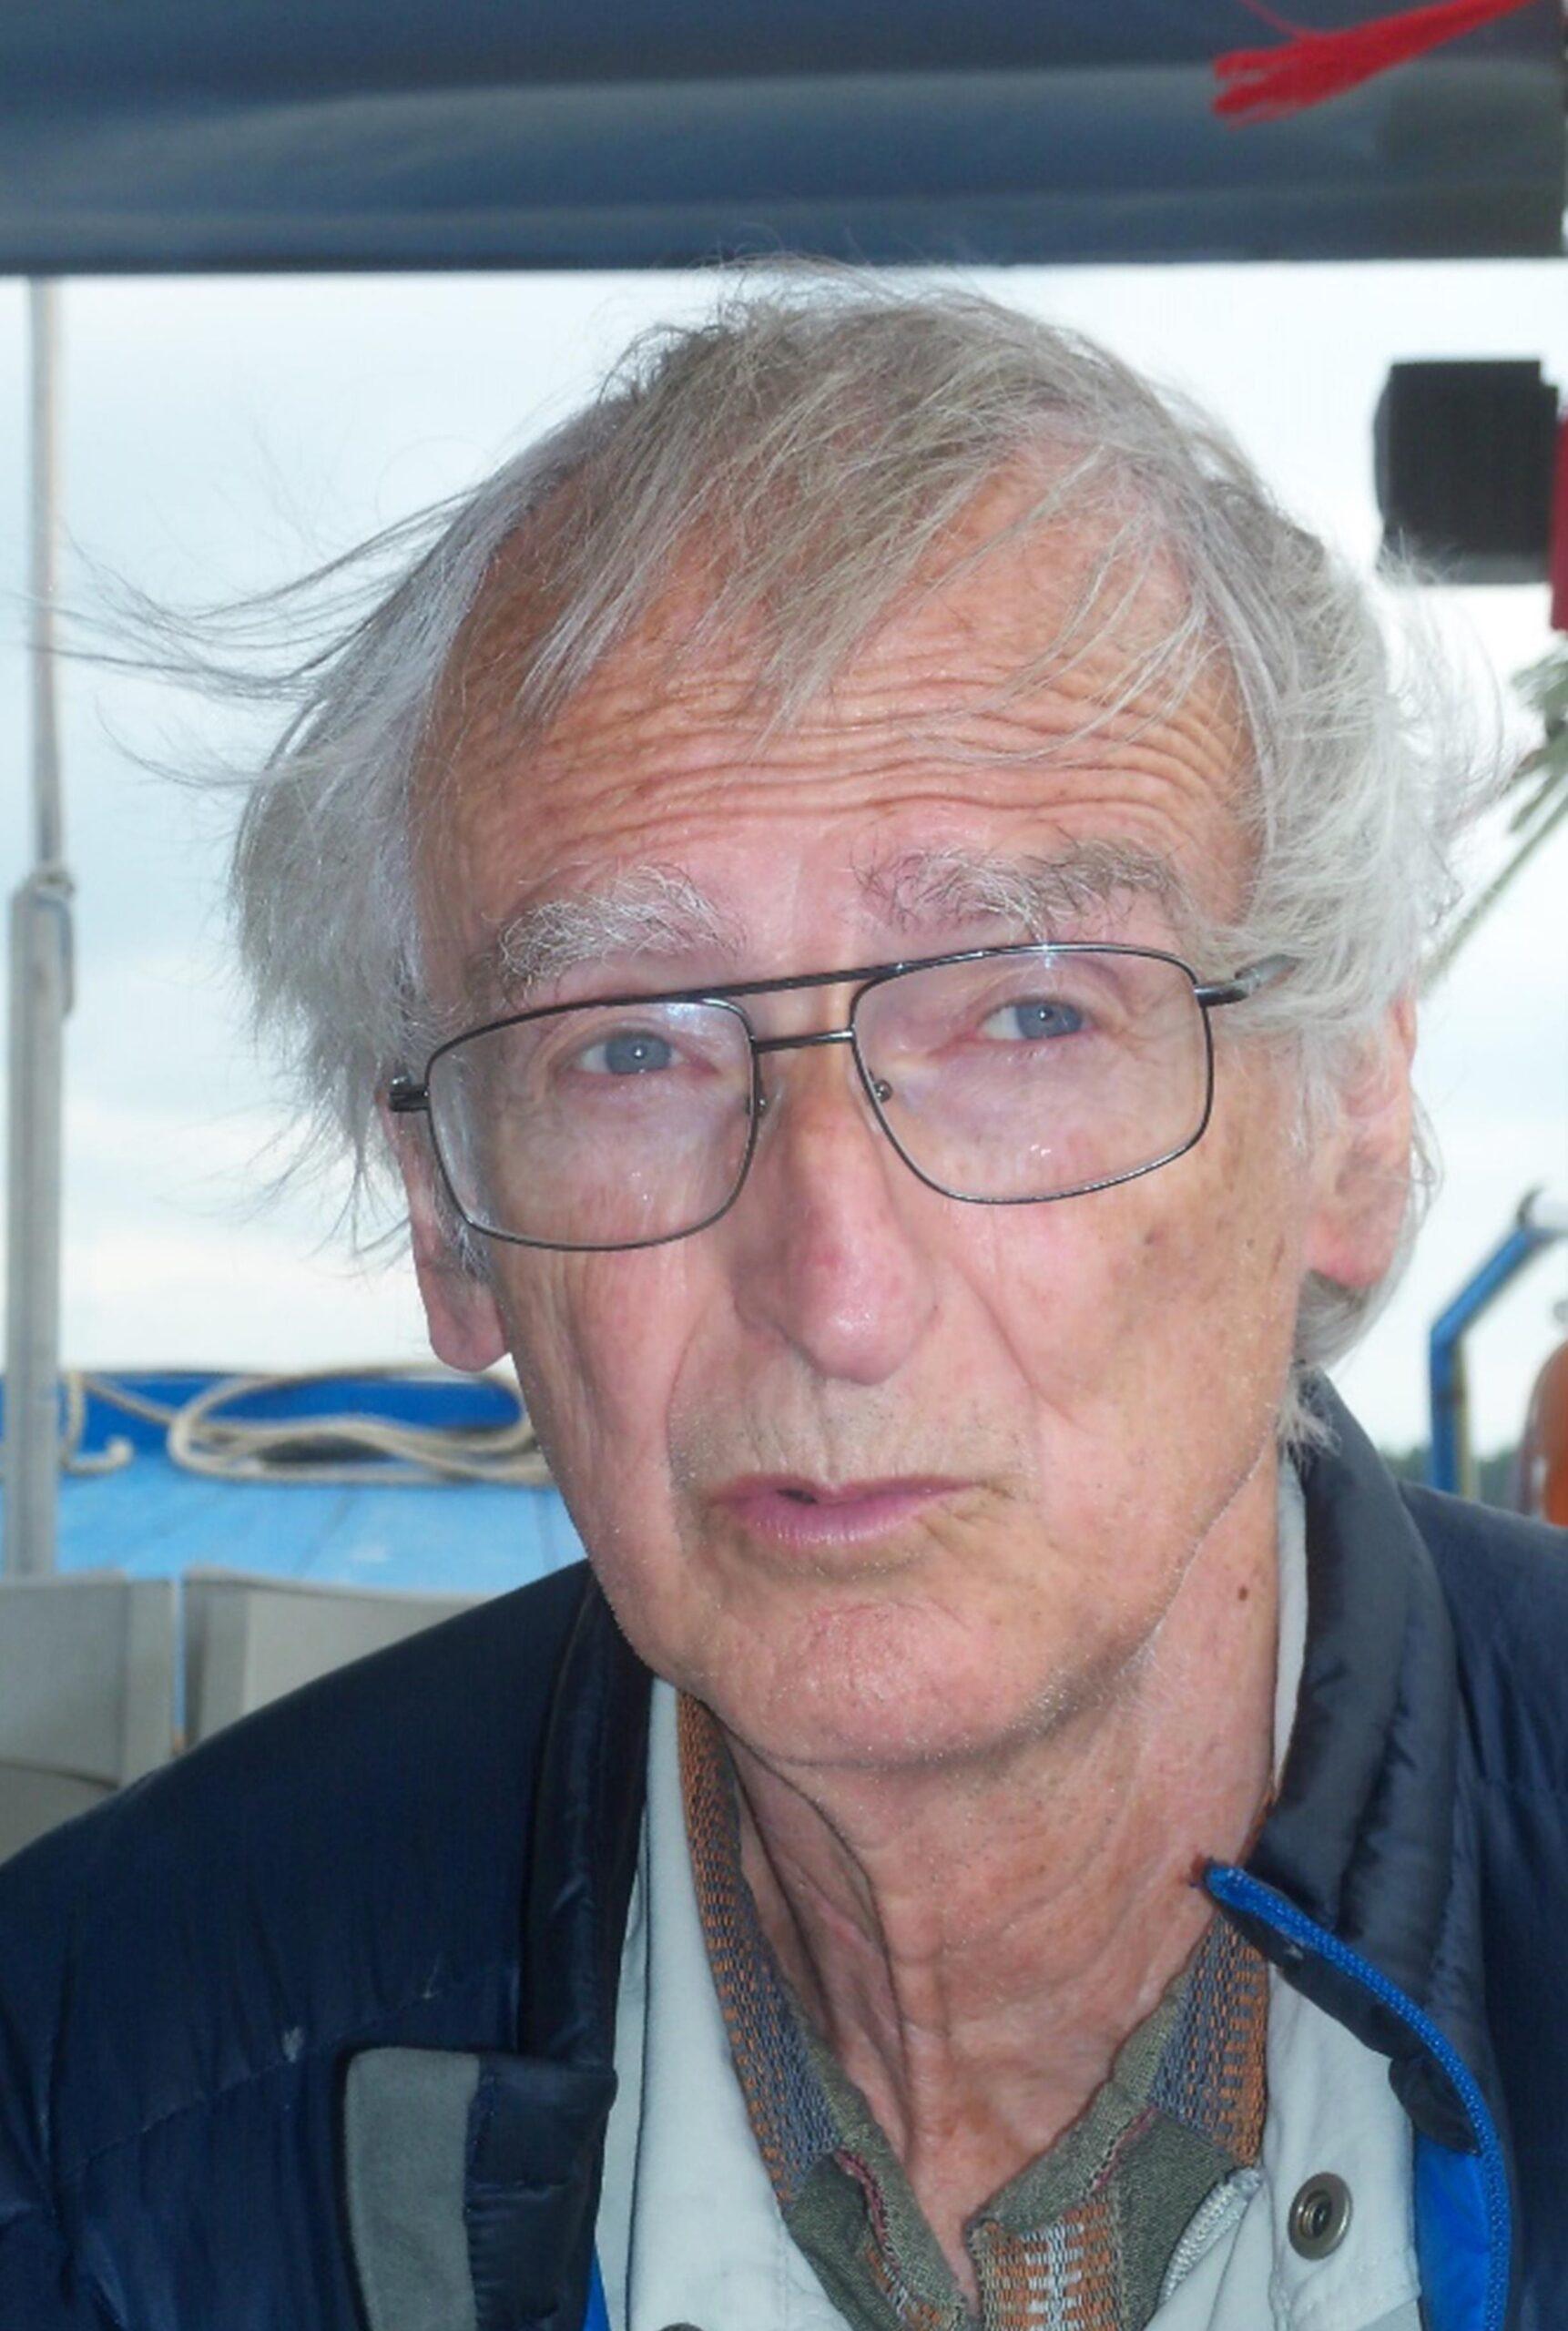 Ken La Gattuta